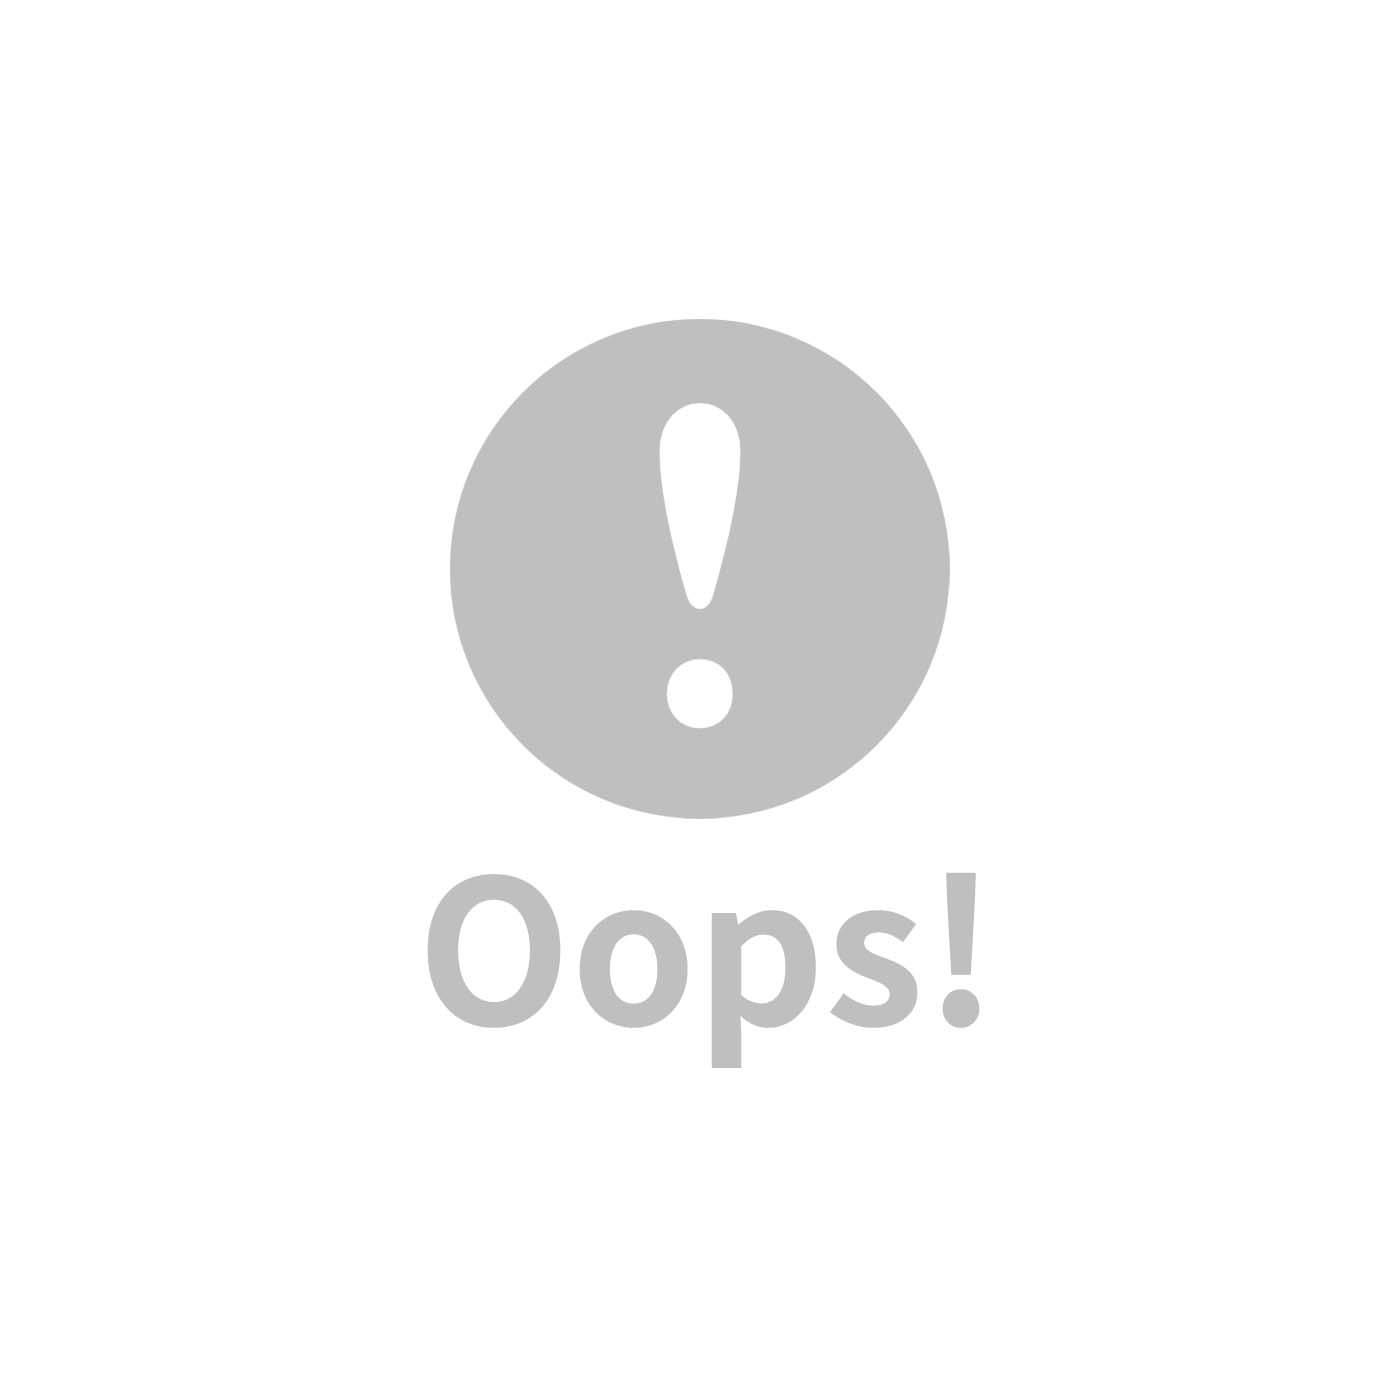 bebeduE 六合一 副食品聰明懶人包-附悶燒盒(3款可選)